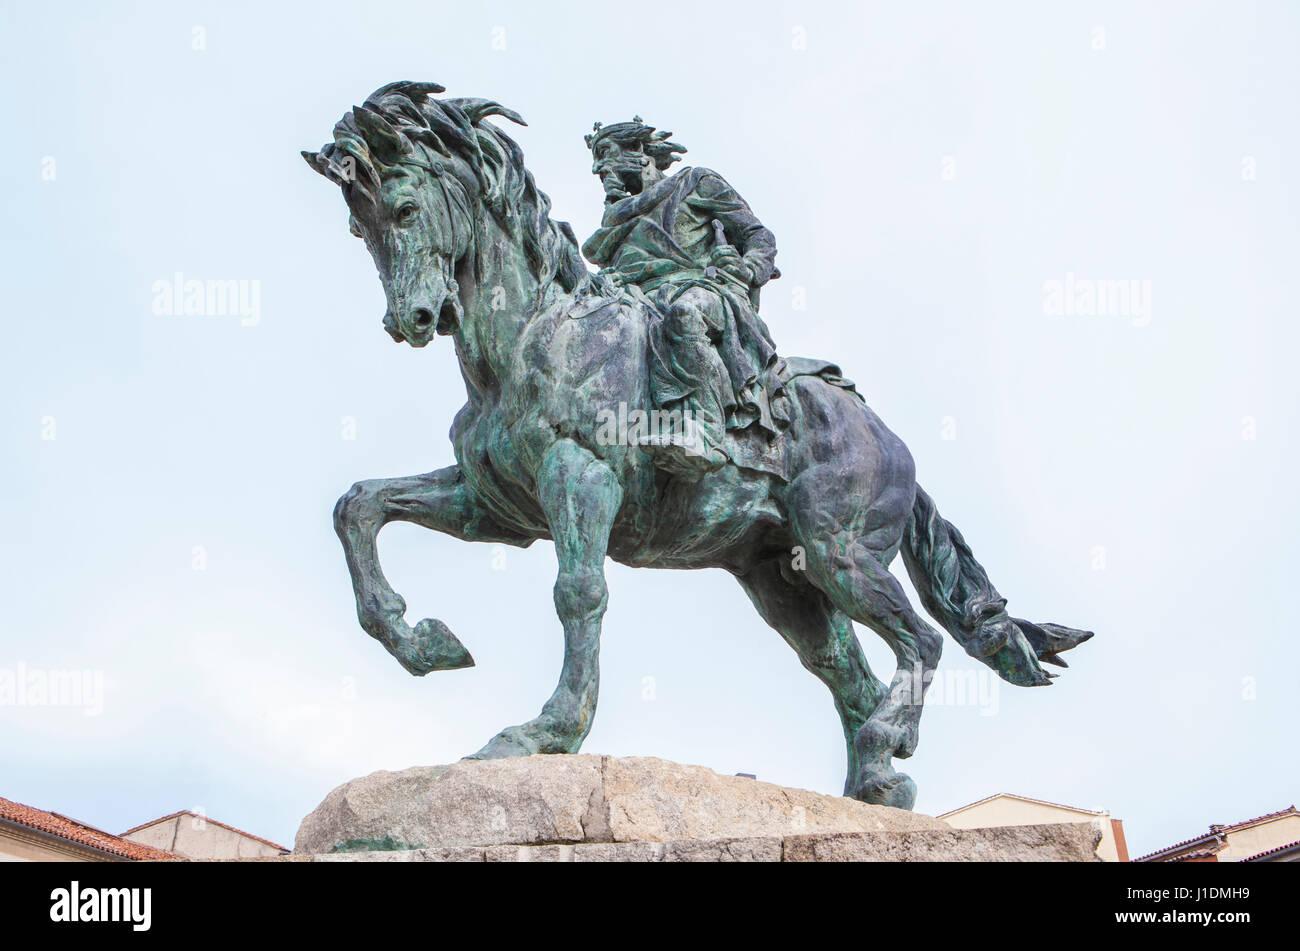 Plasencia, Spain - February 15, 2017: Equestrian Statue of Alfonso VIII of Castile, conqueror of Plasencia to Almohads - Stock Image